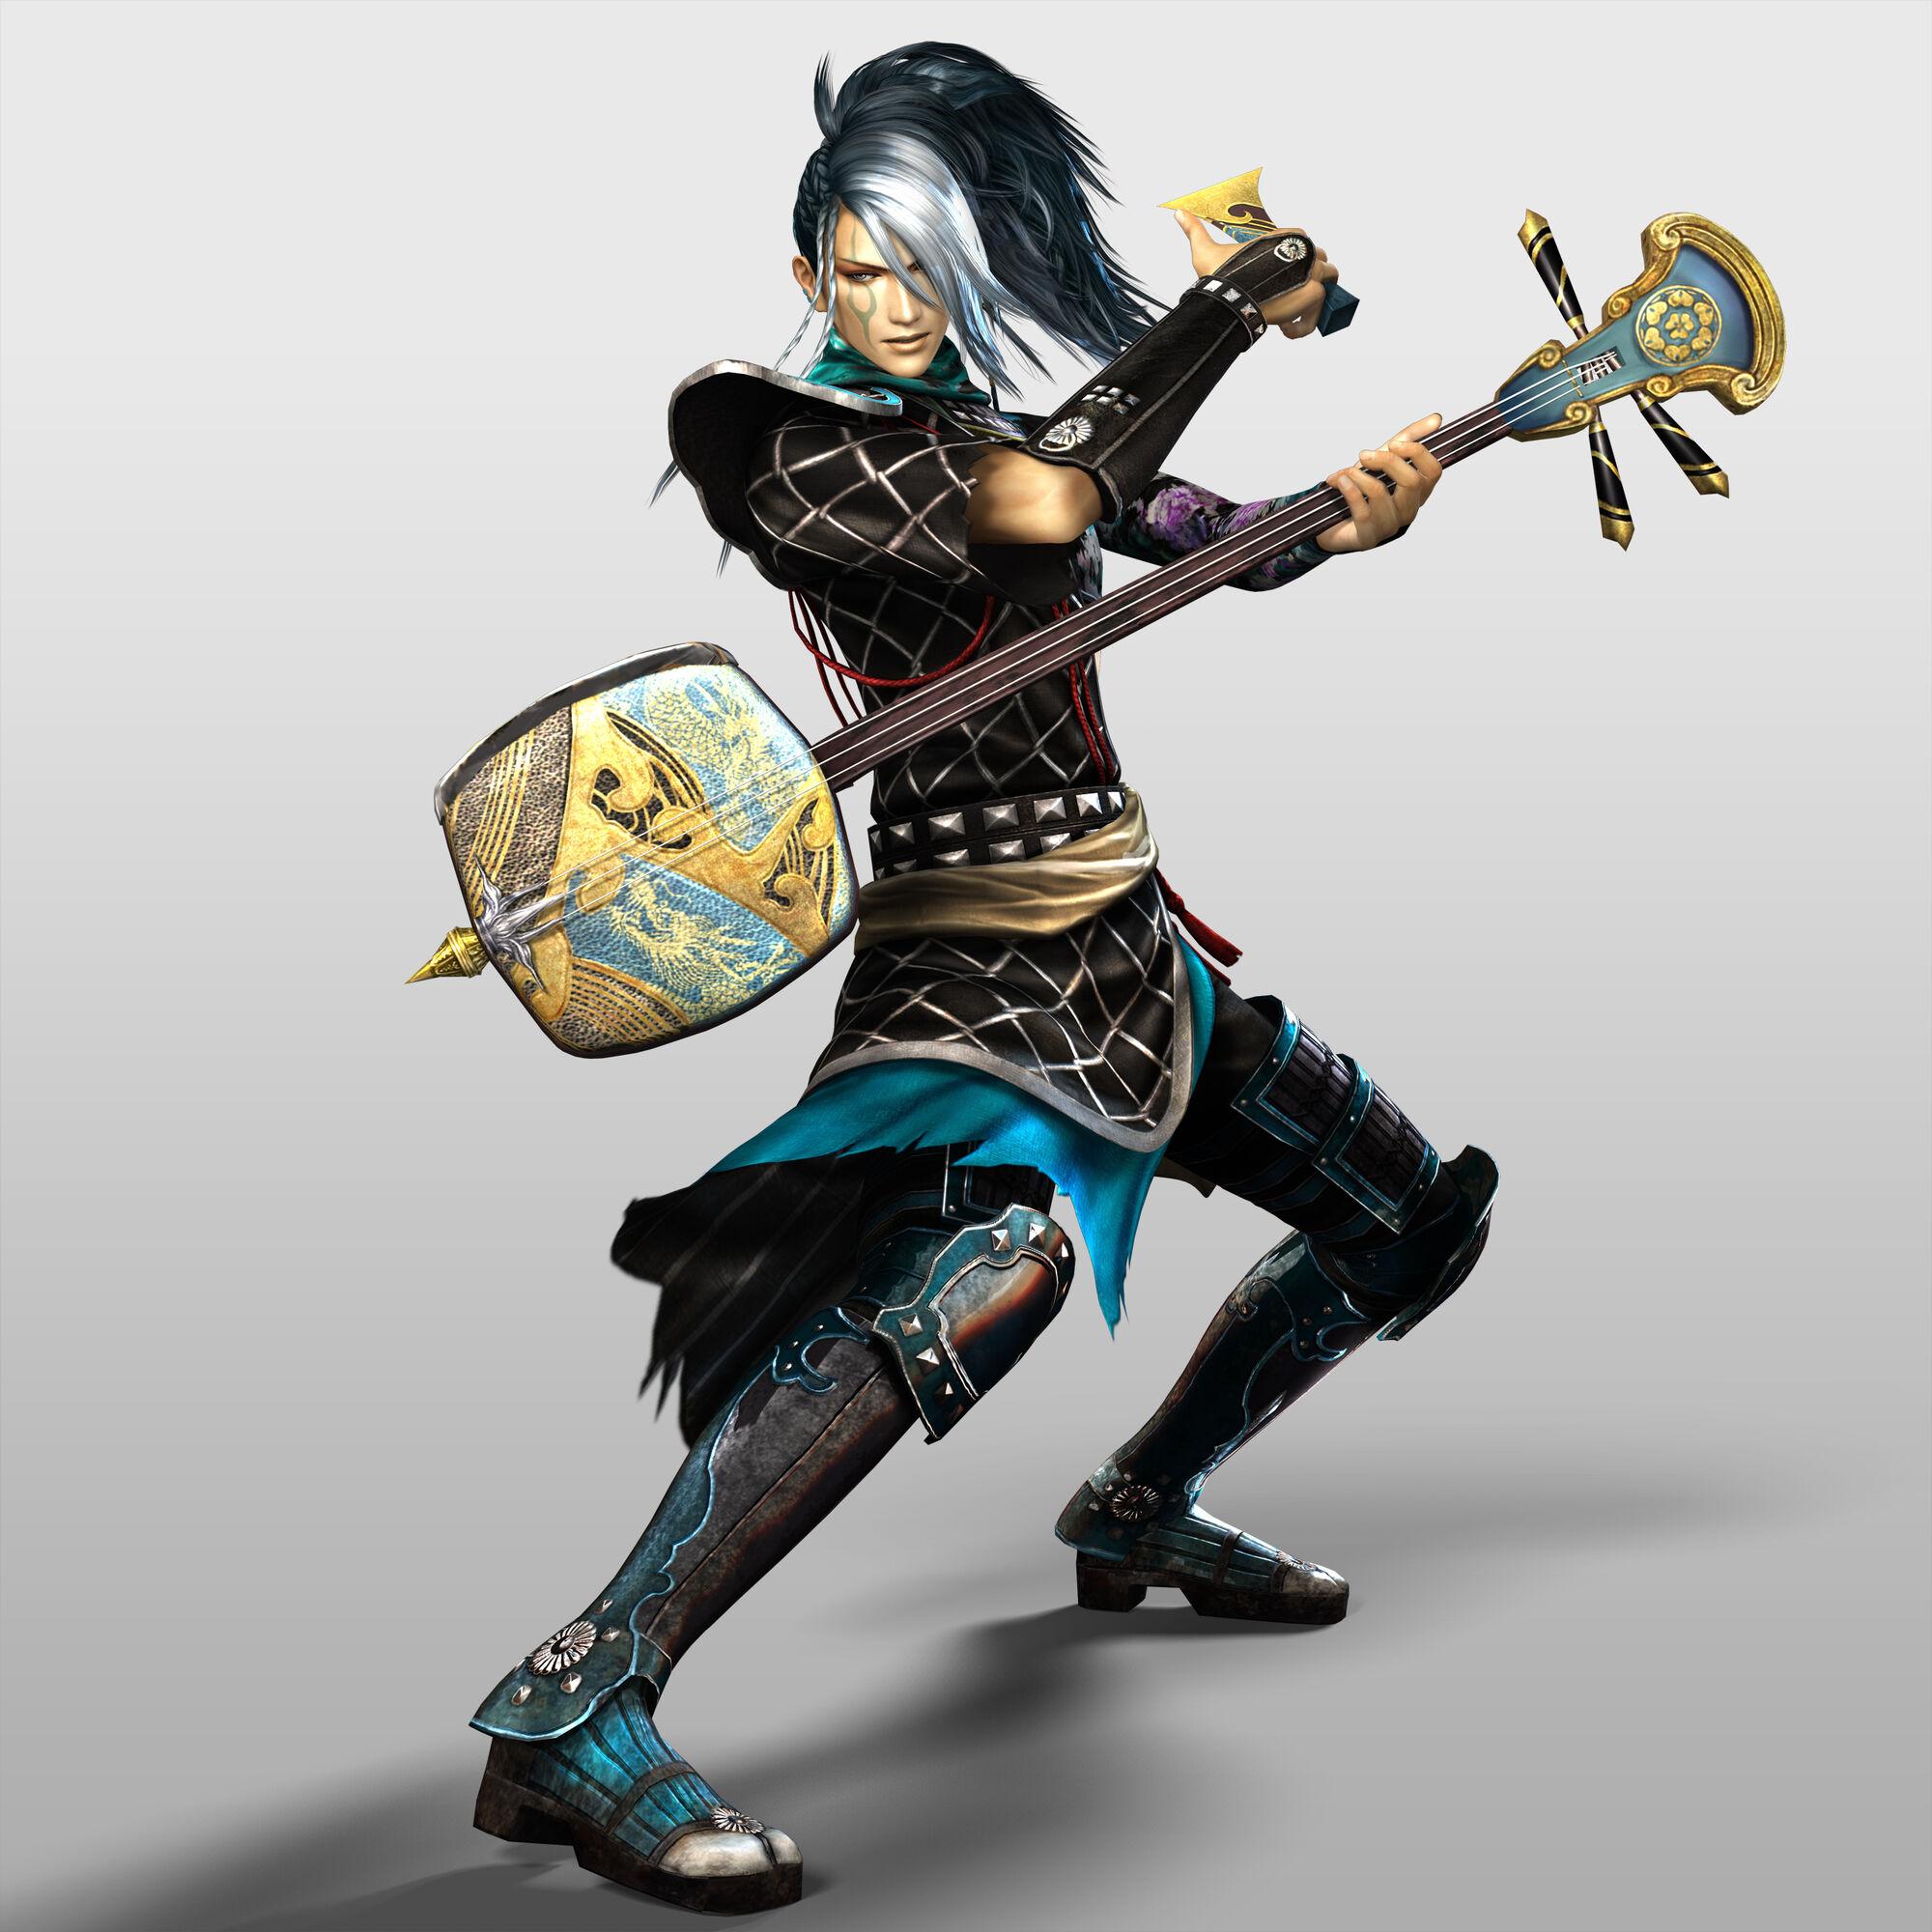 Warriors Orochi 4 Characters List: Image - Motochika-sw4.jpg